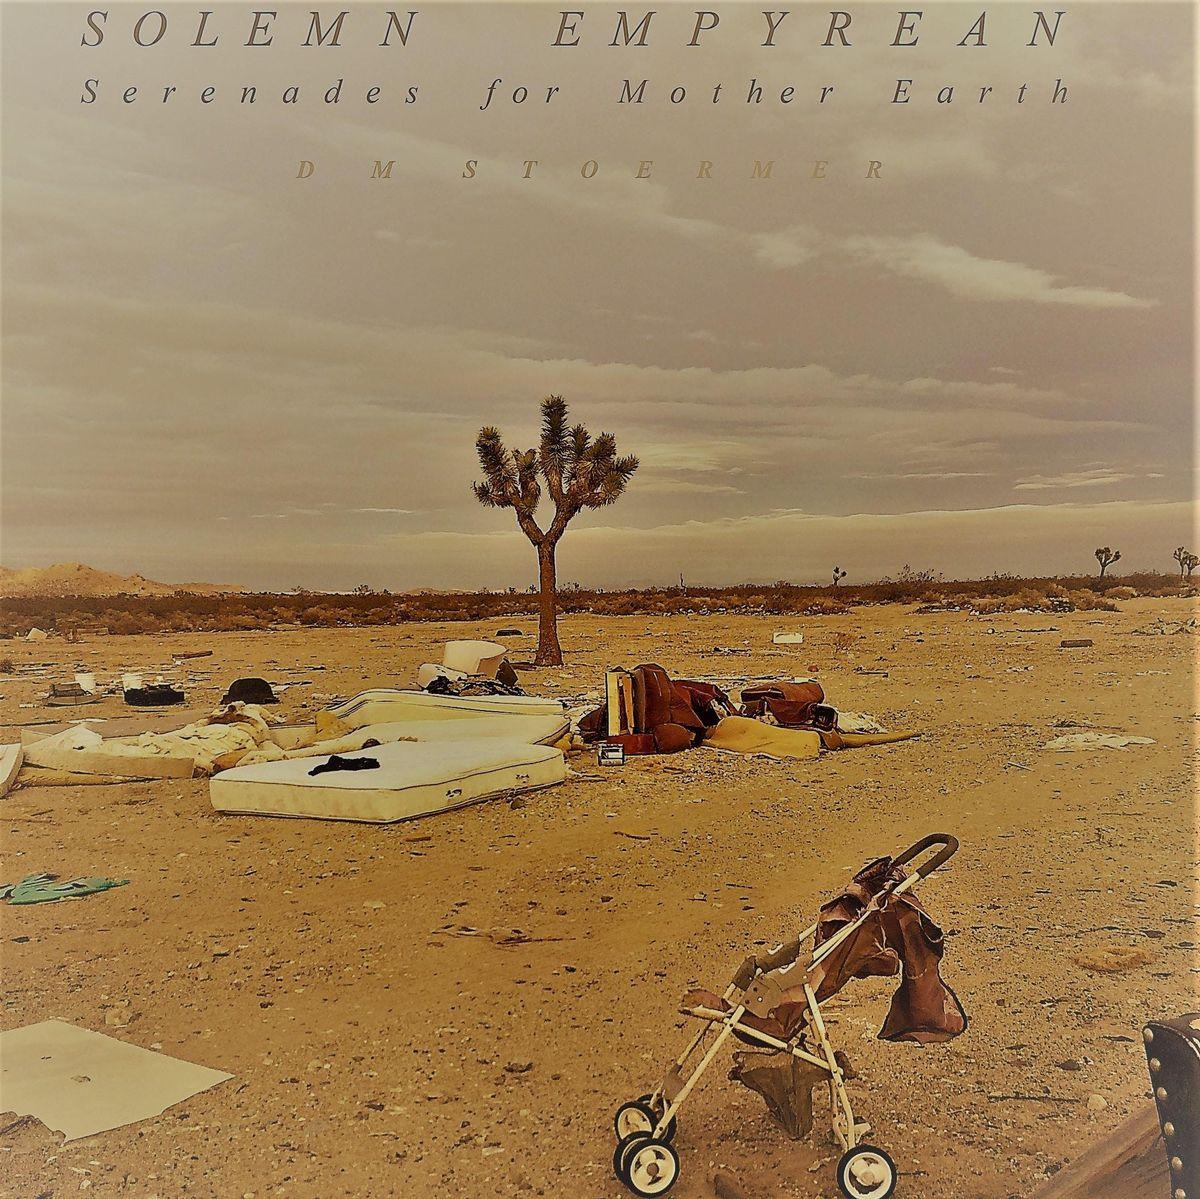 Solemn Empyrean (Serenades for Mother Earth)